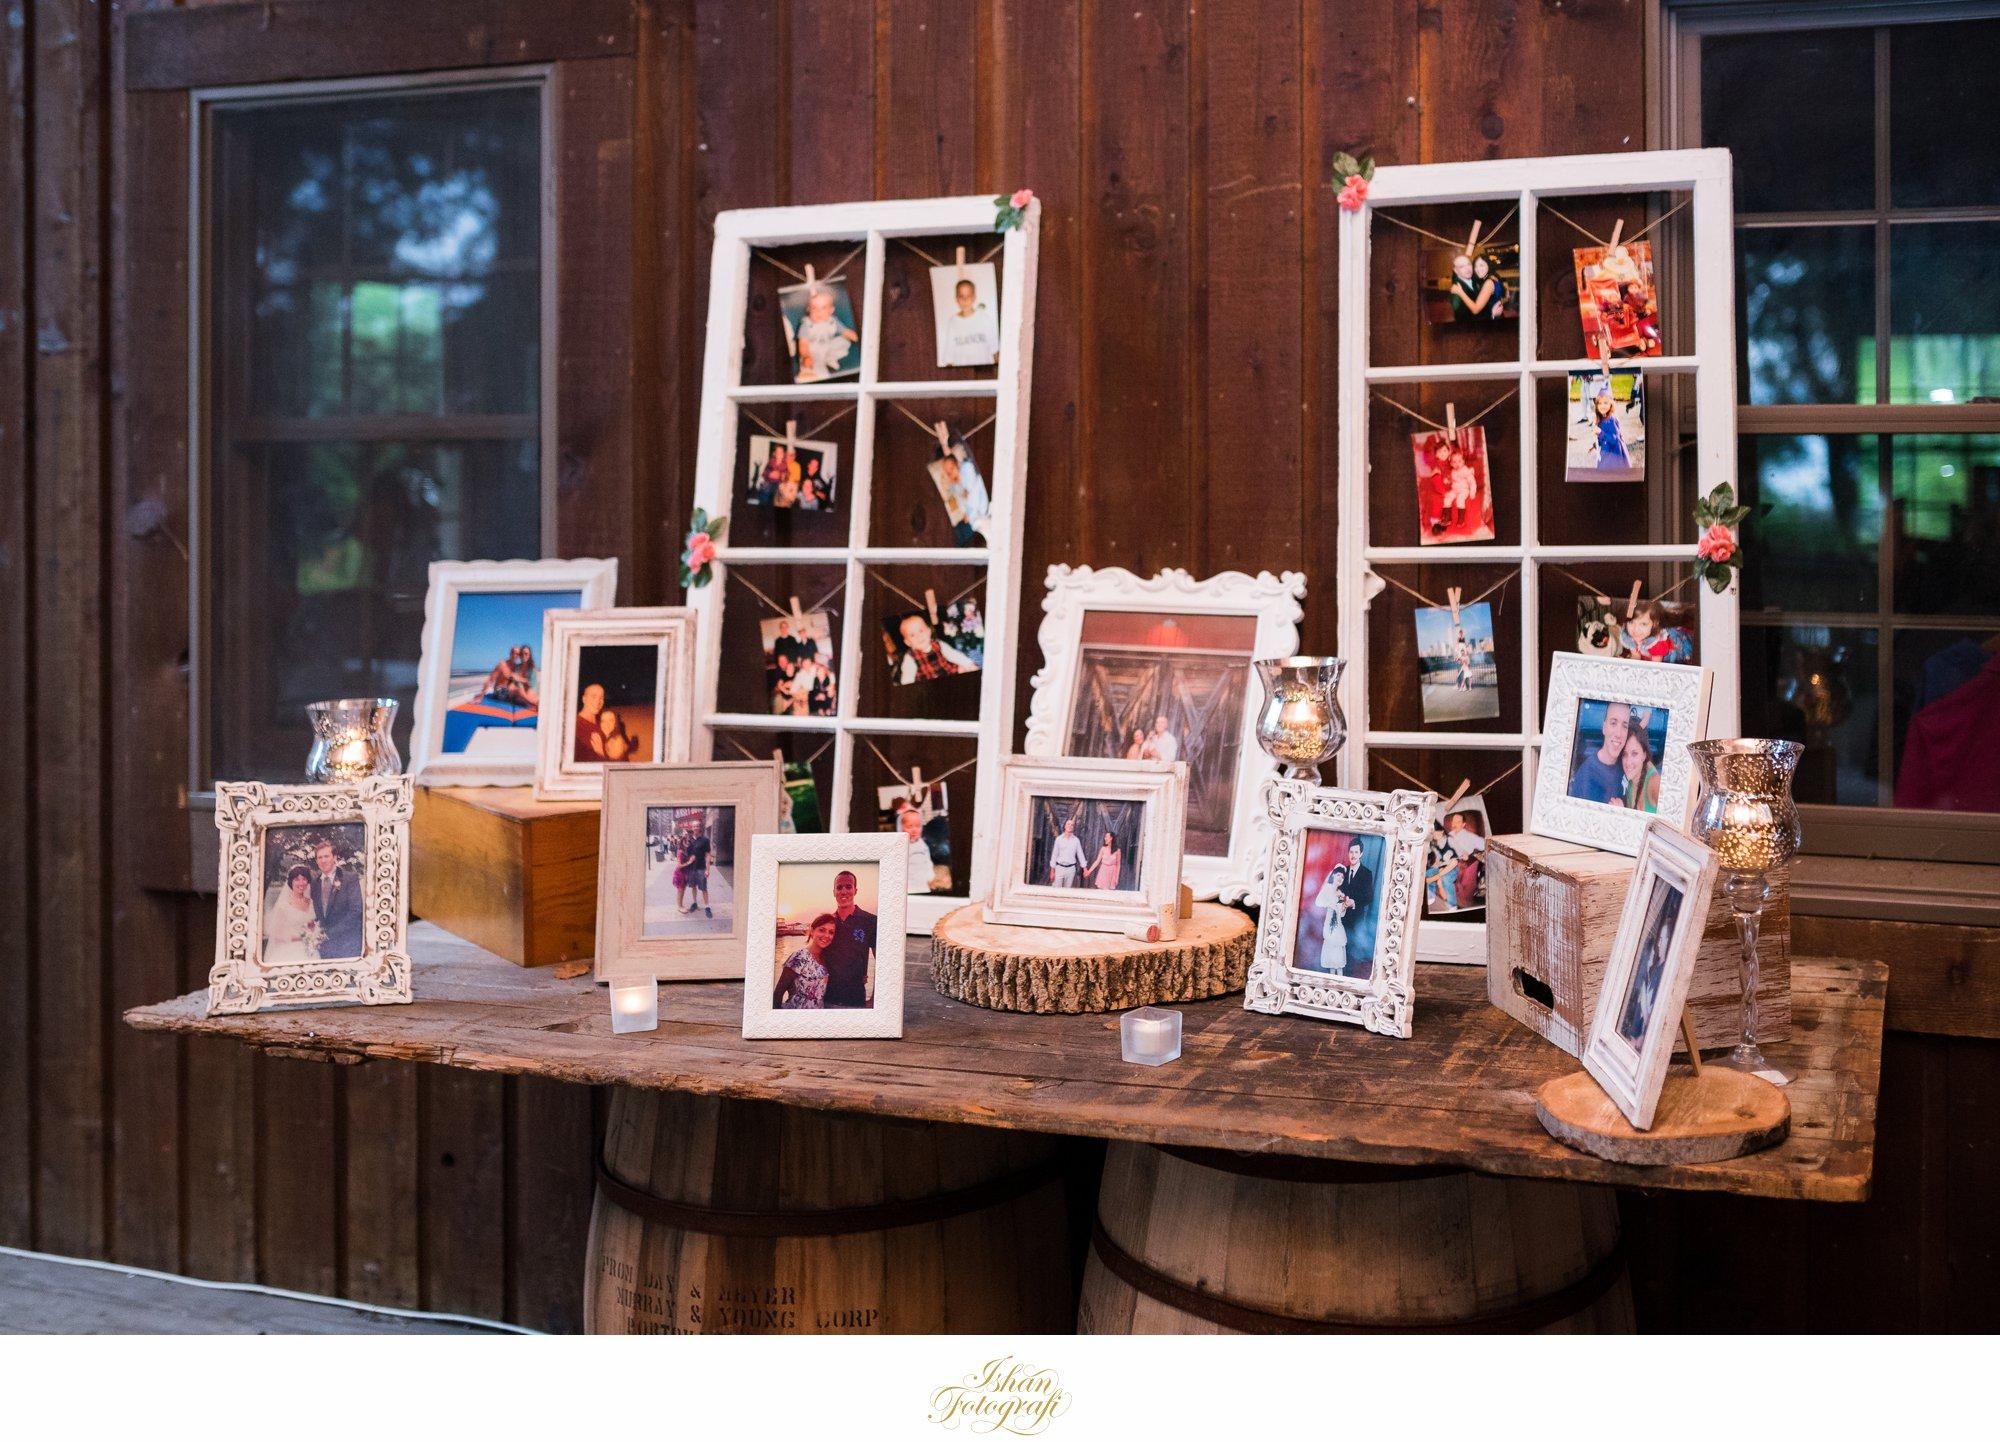 minerals-resort-and-spa-wedding-reception-photos-hamburg-nj